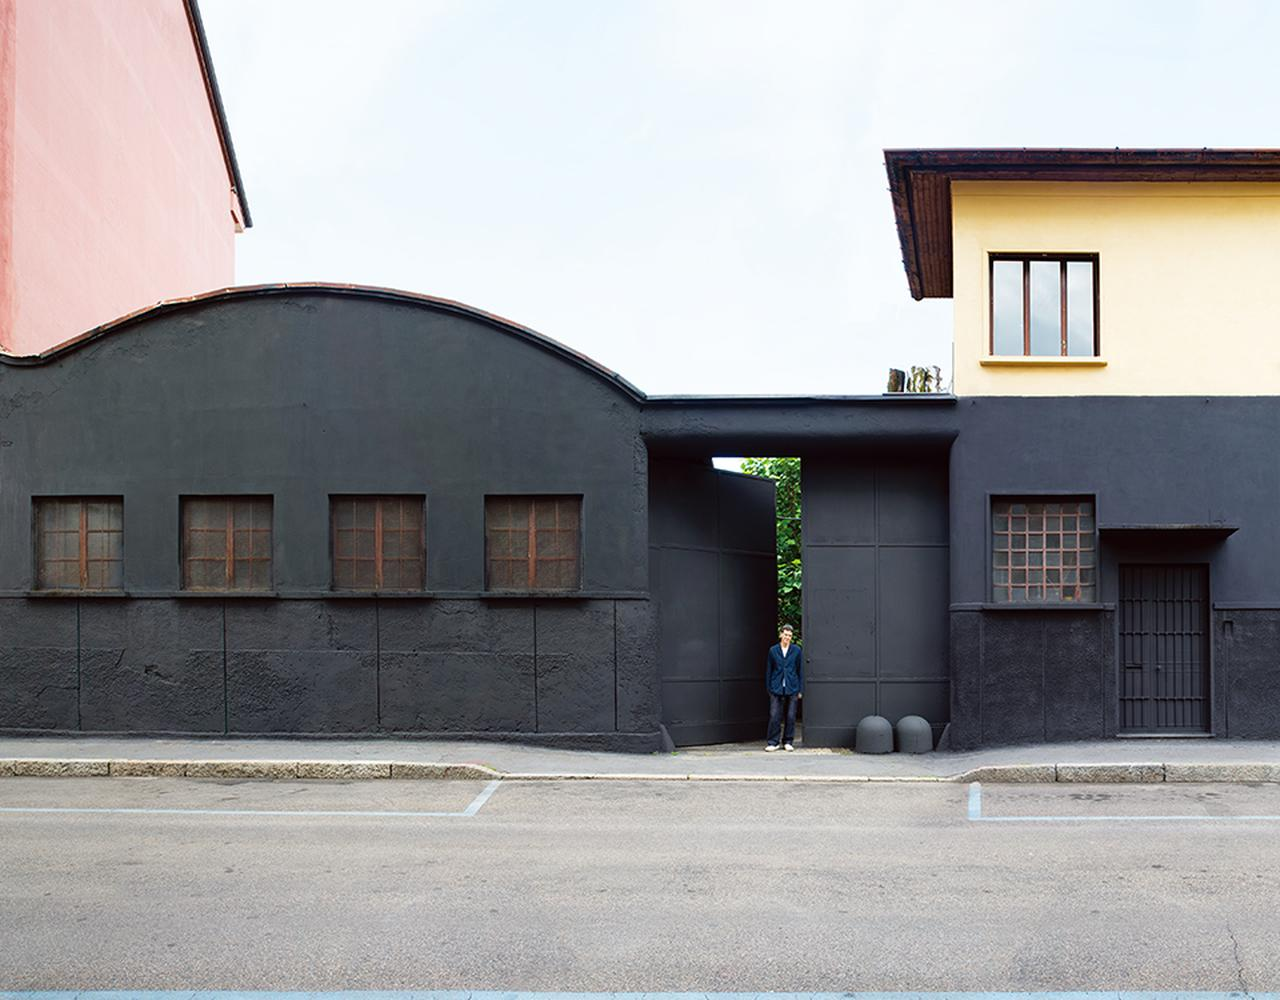 Images : 1番目の画像 - 「建築家トニョンが試みる 実験的な住まいのかたち」のアルバム - T JAPAN:The New York Times Style Magazine 公式サイト